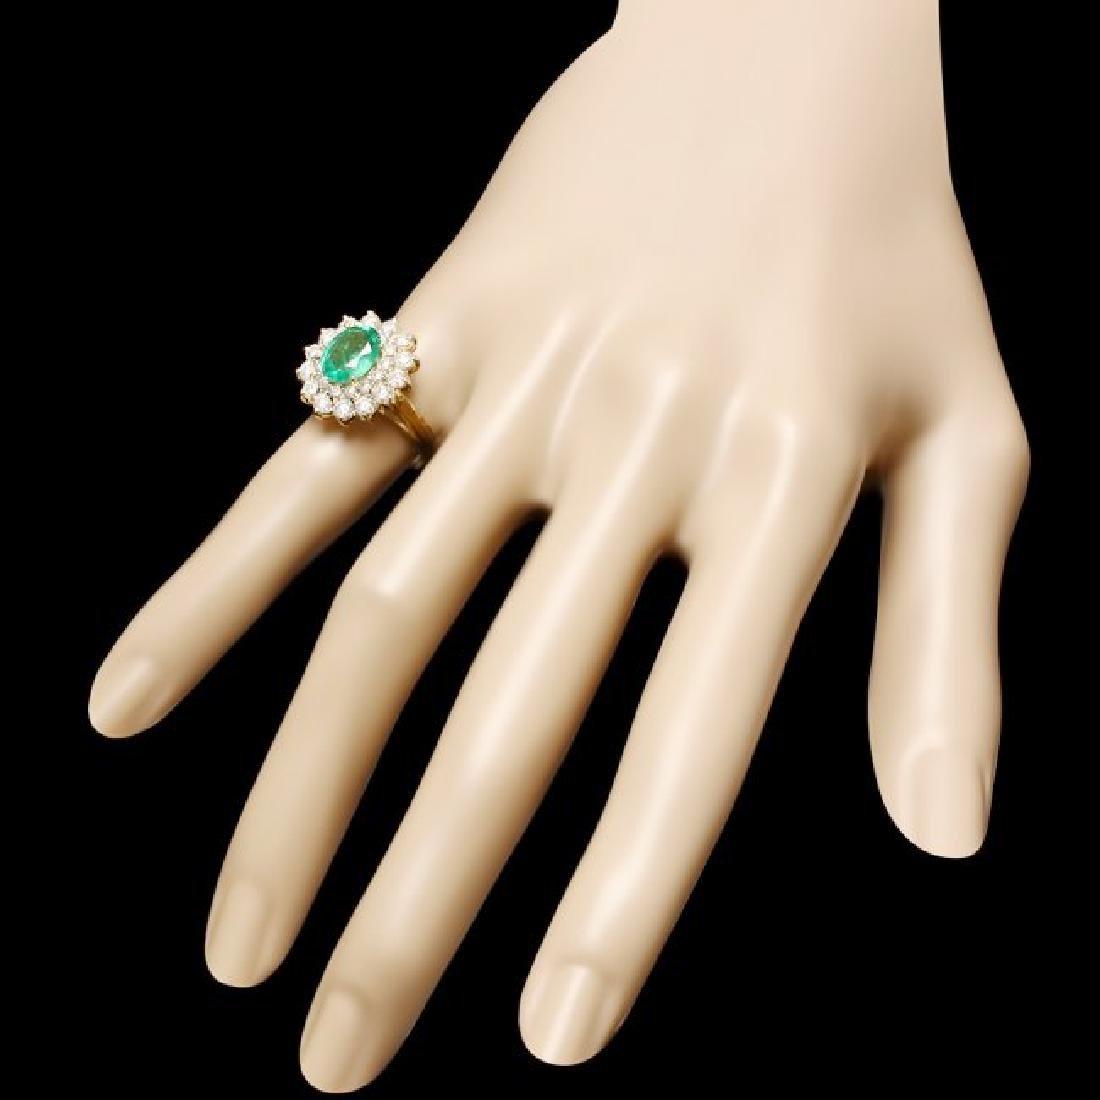 14k Gold 1.50ct Emerald 1.35ct Diamond Ring - 3